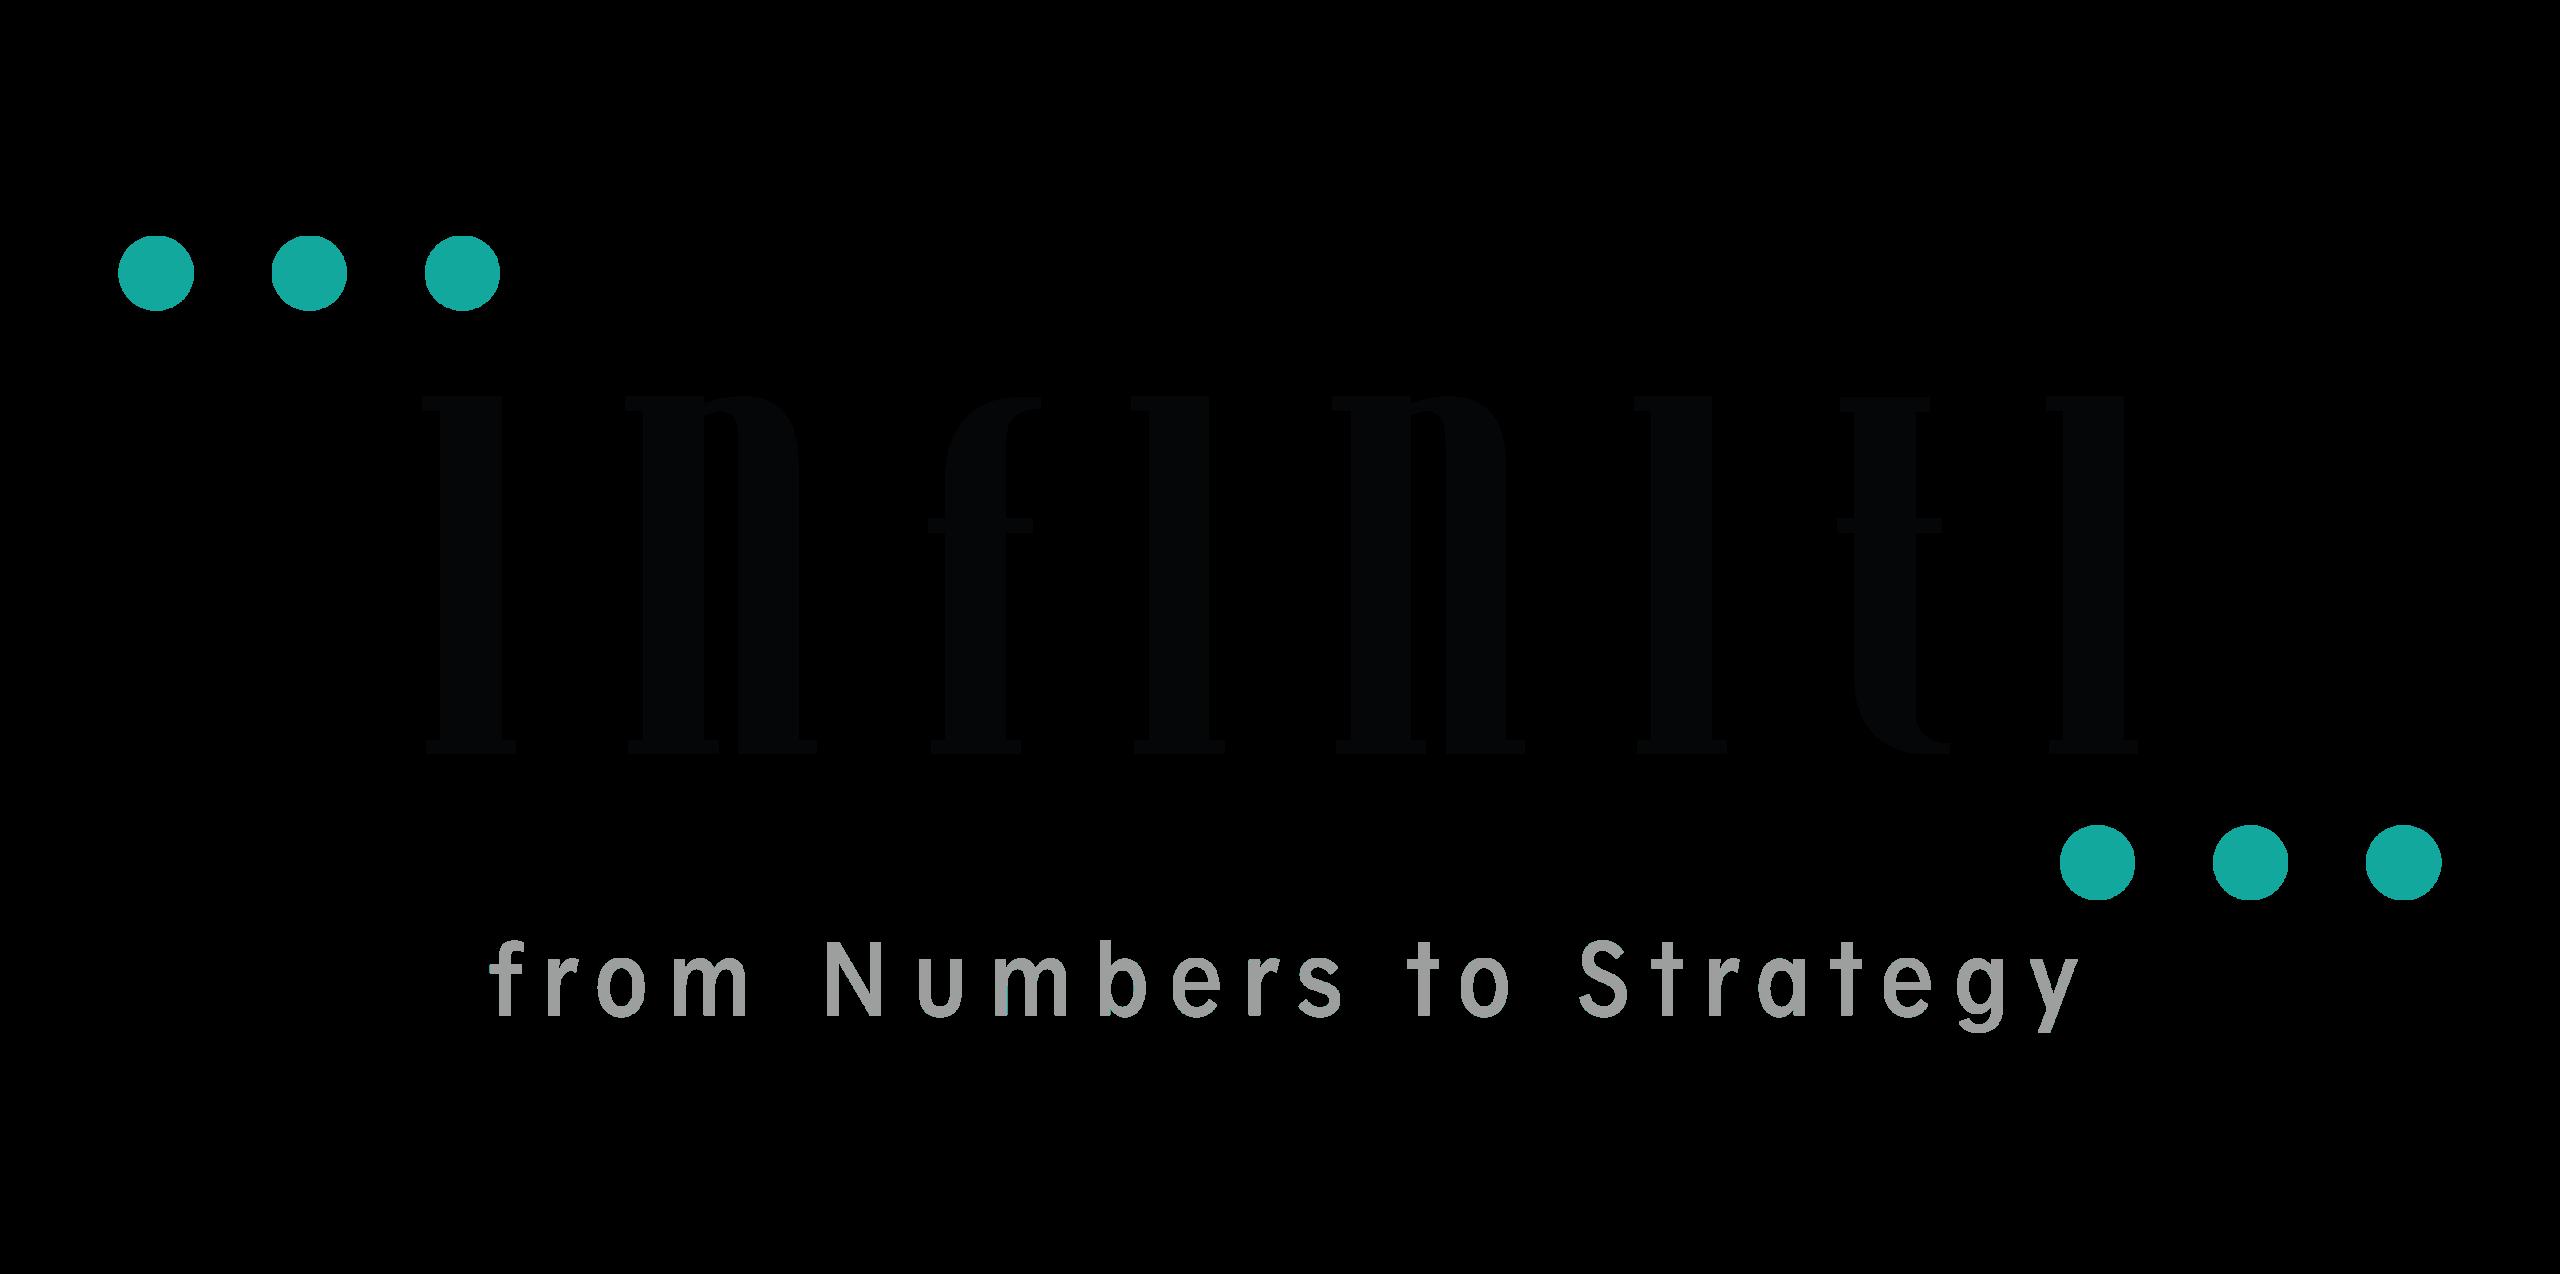 Infiniti - Digital Marketing Company in Thane | Development, Branding , Media and Event